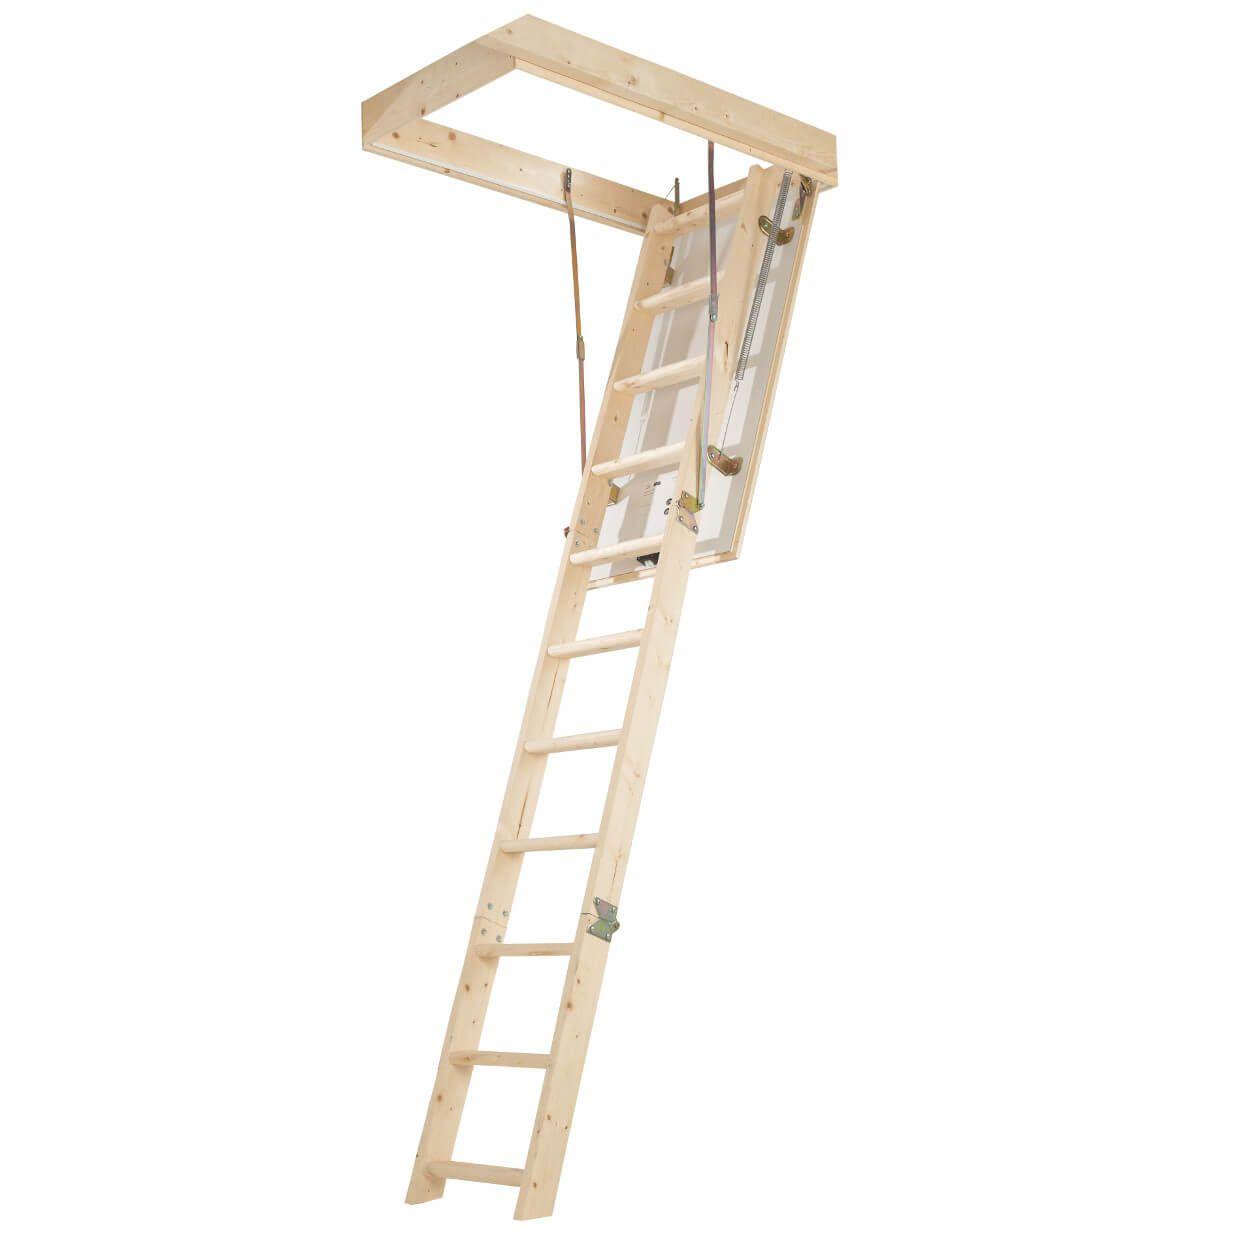 Youngman Timberline DIY Loft Access Kit - 12 Tread / 2.8m